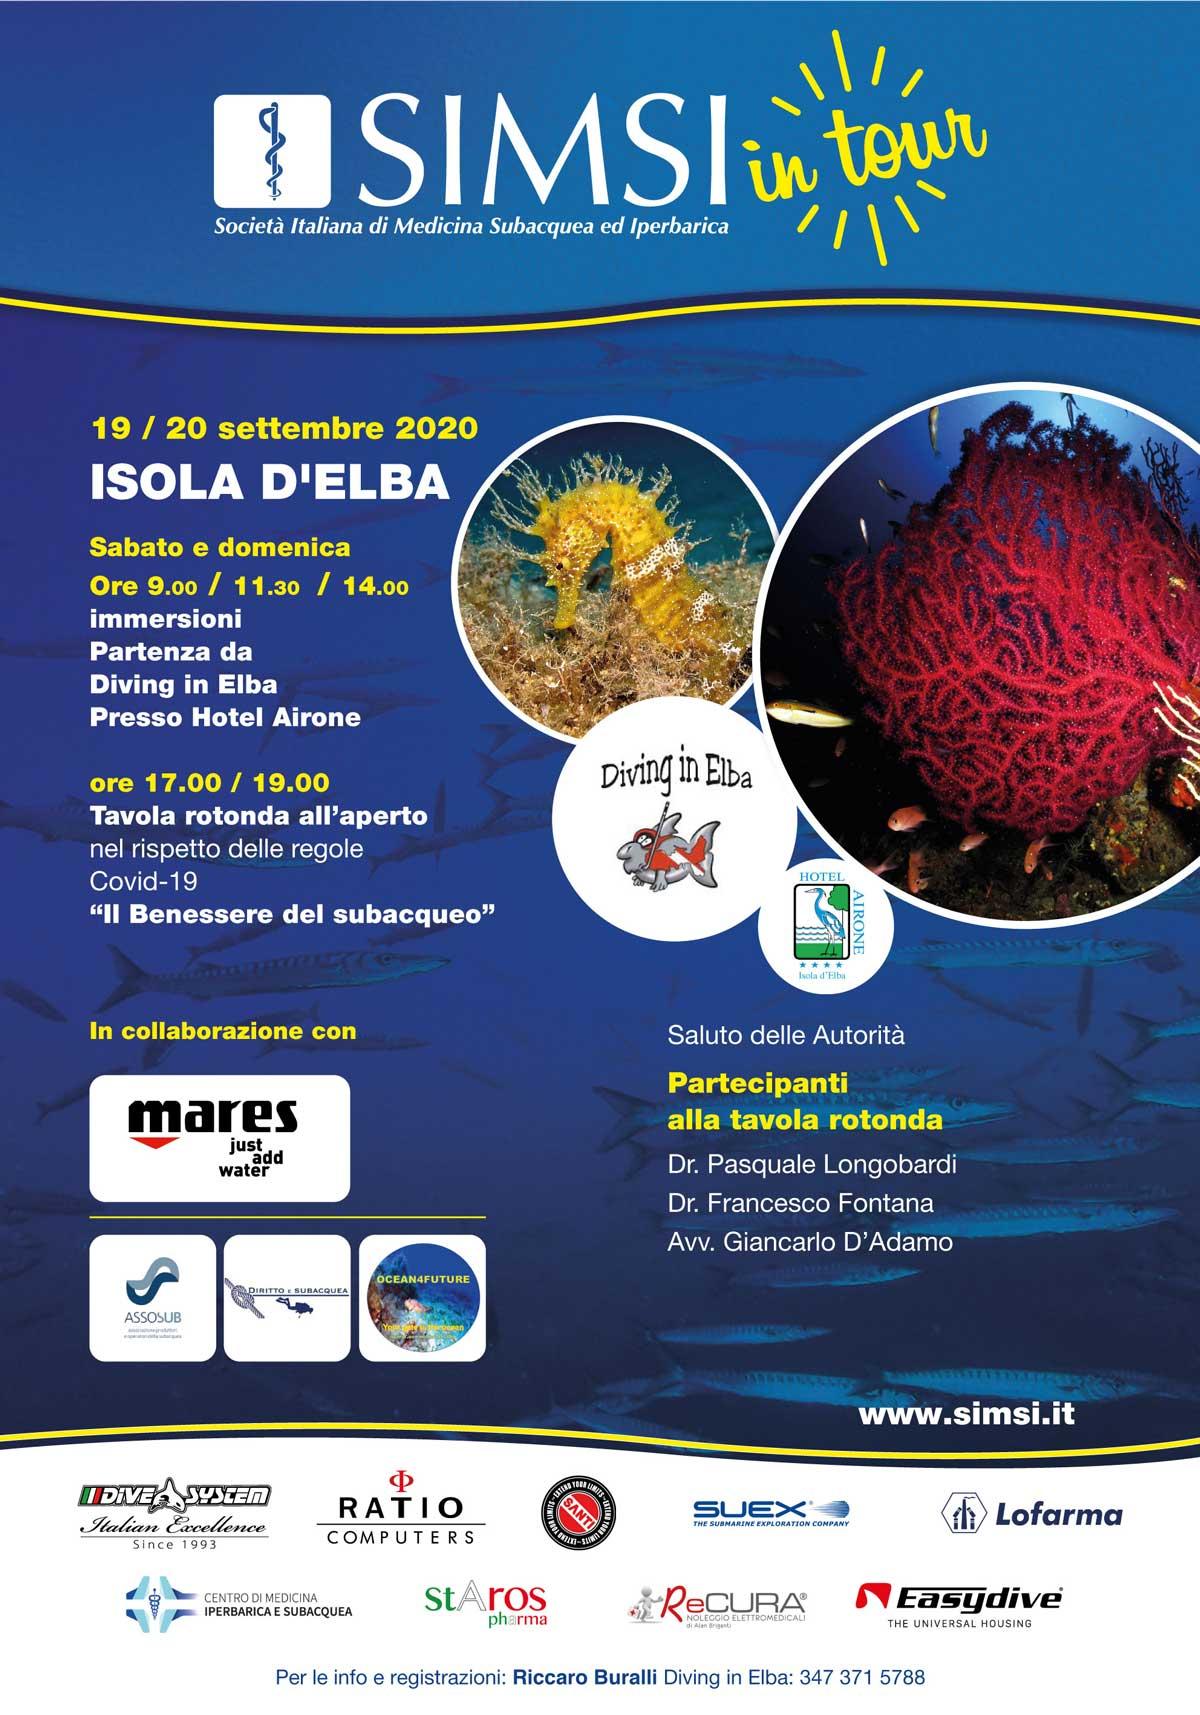 SIMSI-IN-TOUR_isola-d-elba-2020